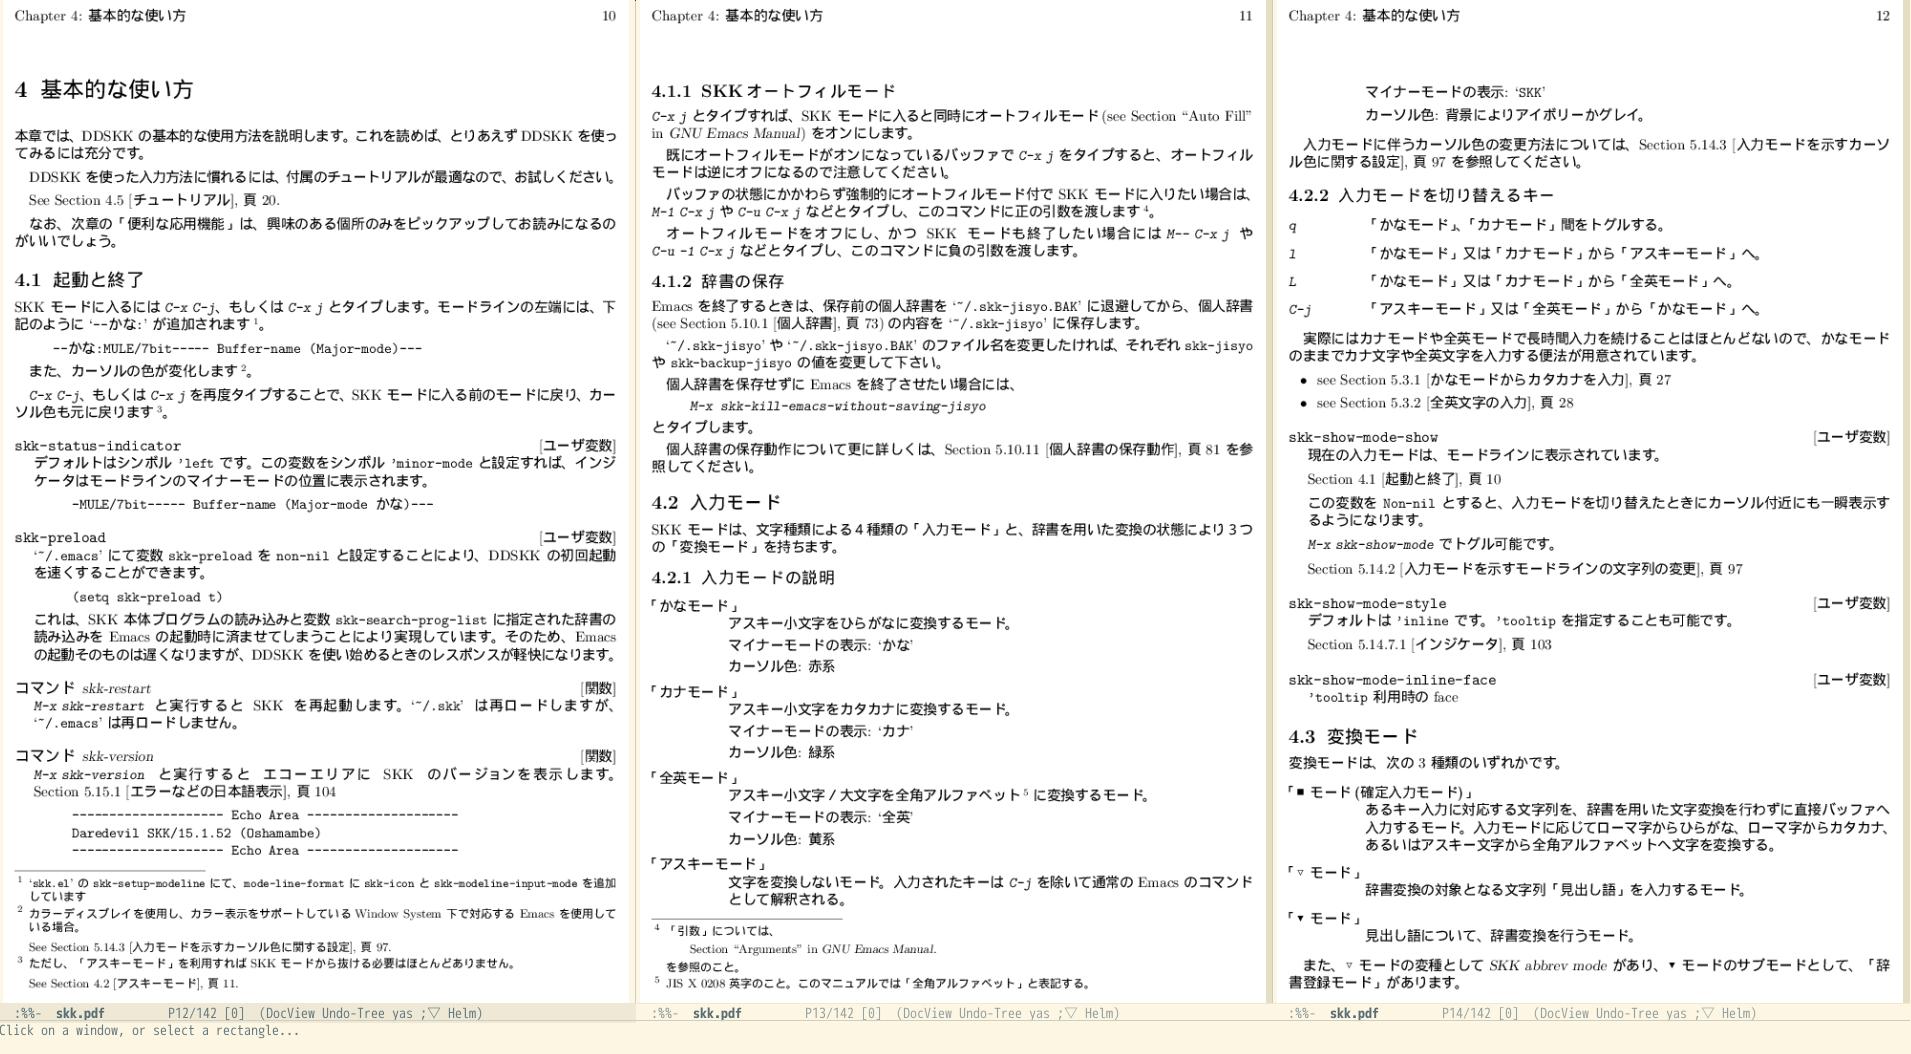 screenshot-06.png